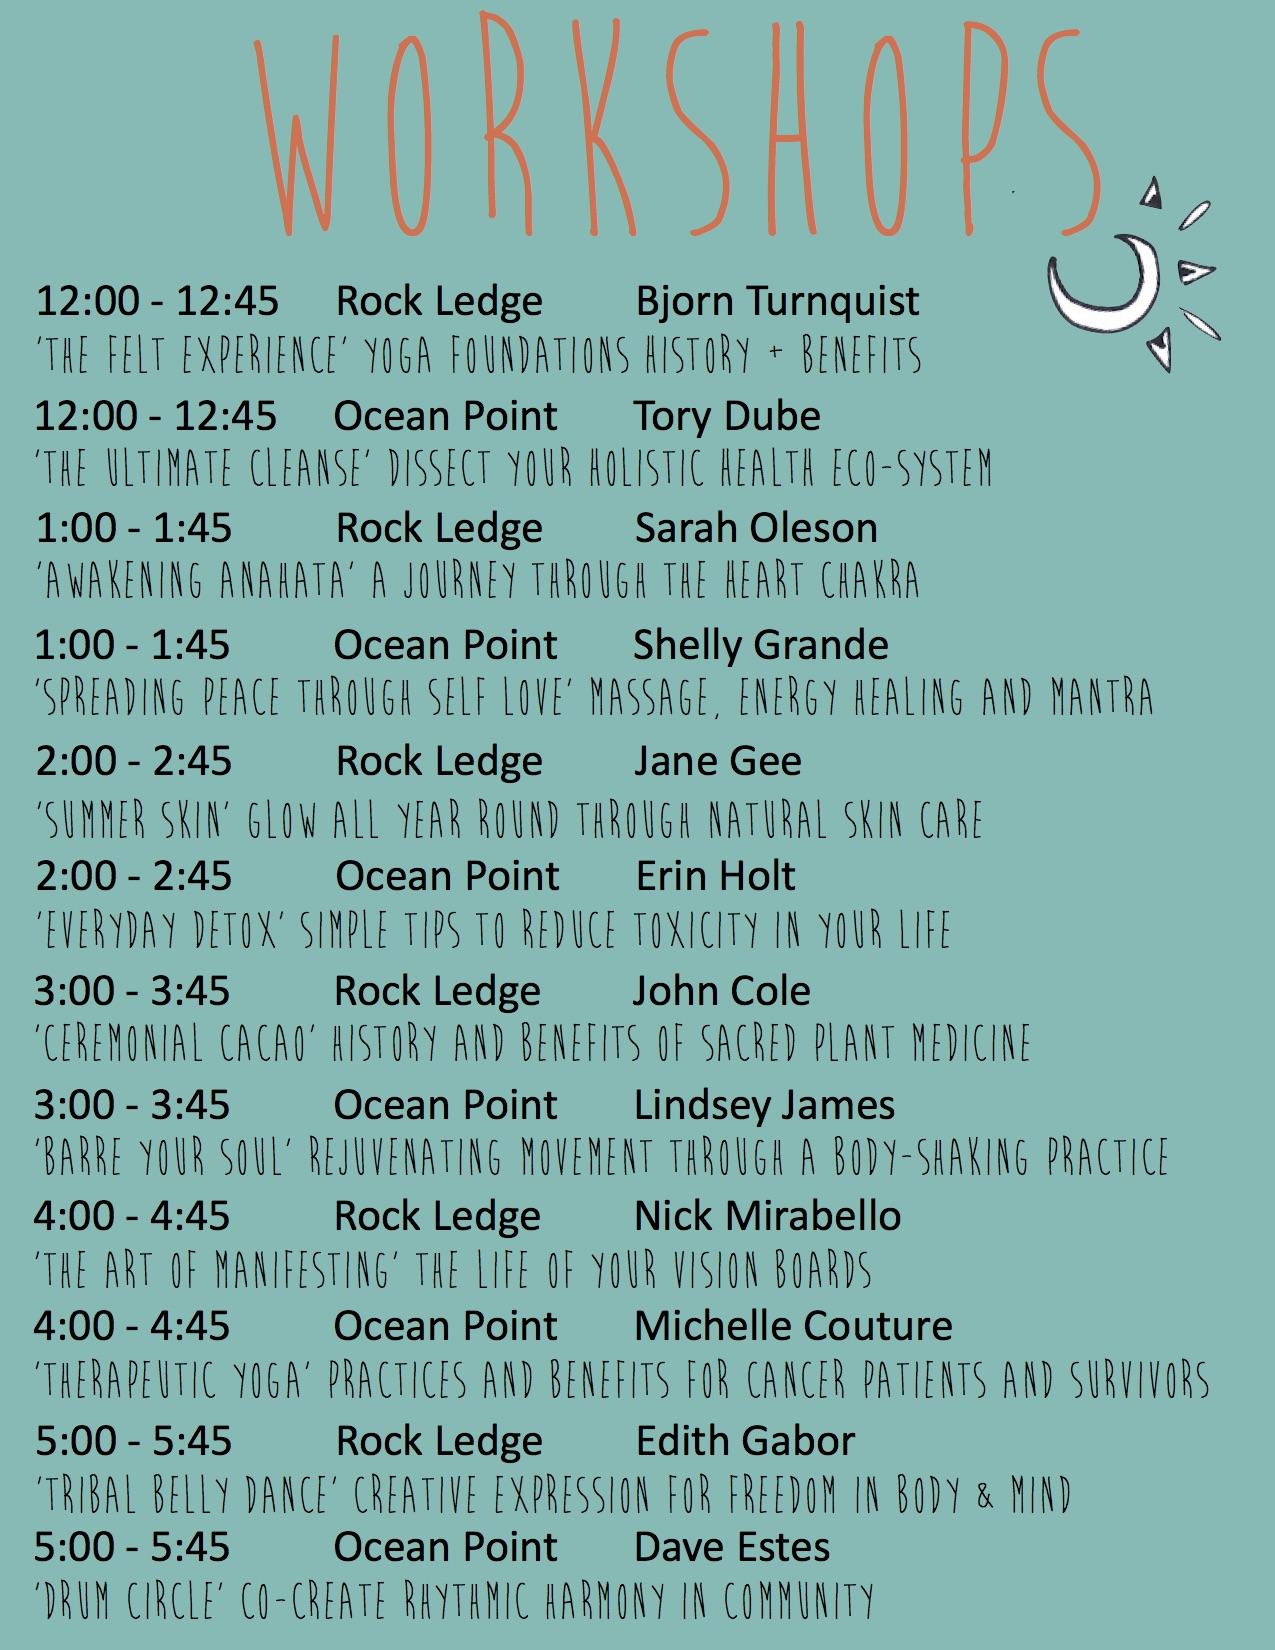 WV Workshop 2016 Schedule